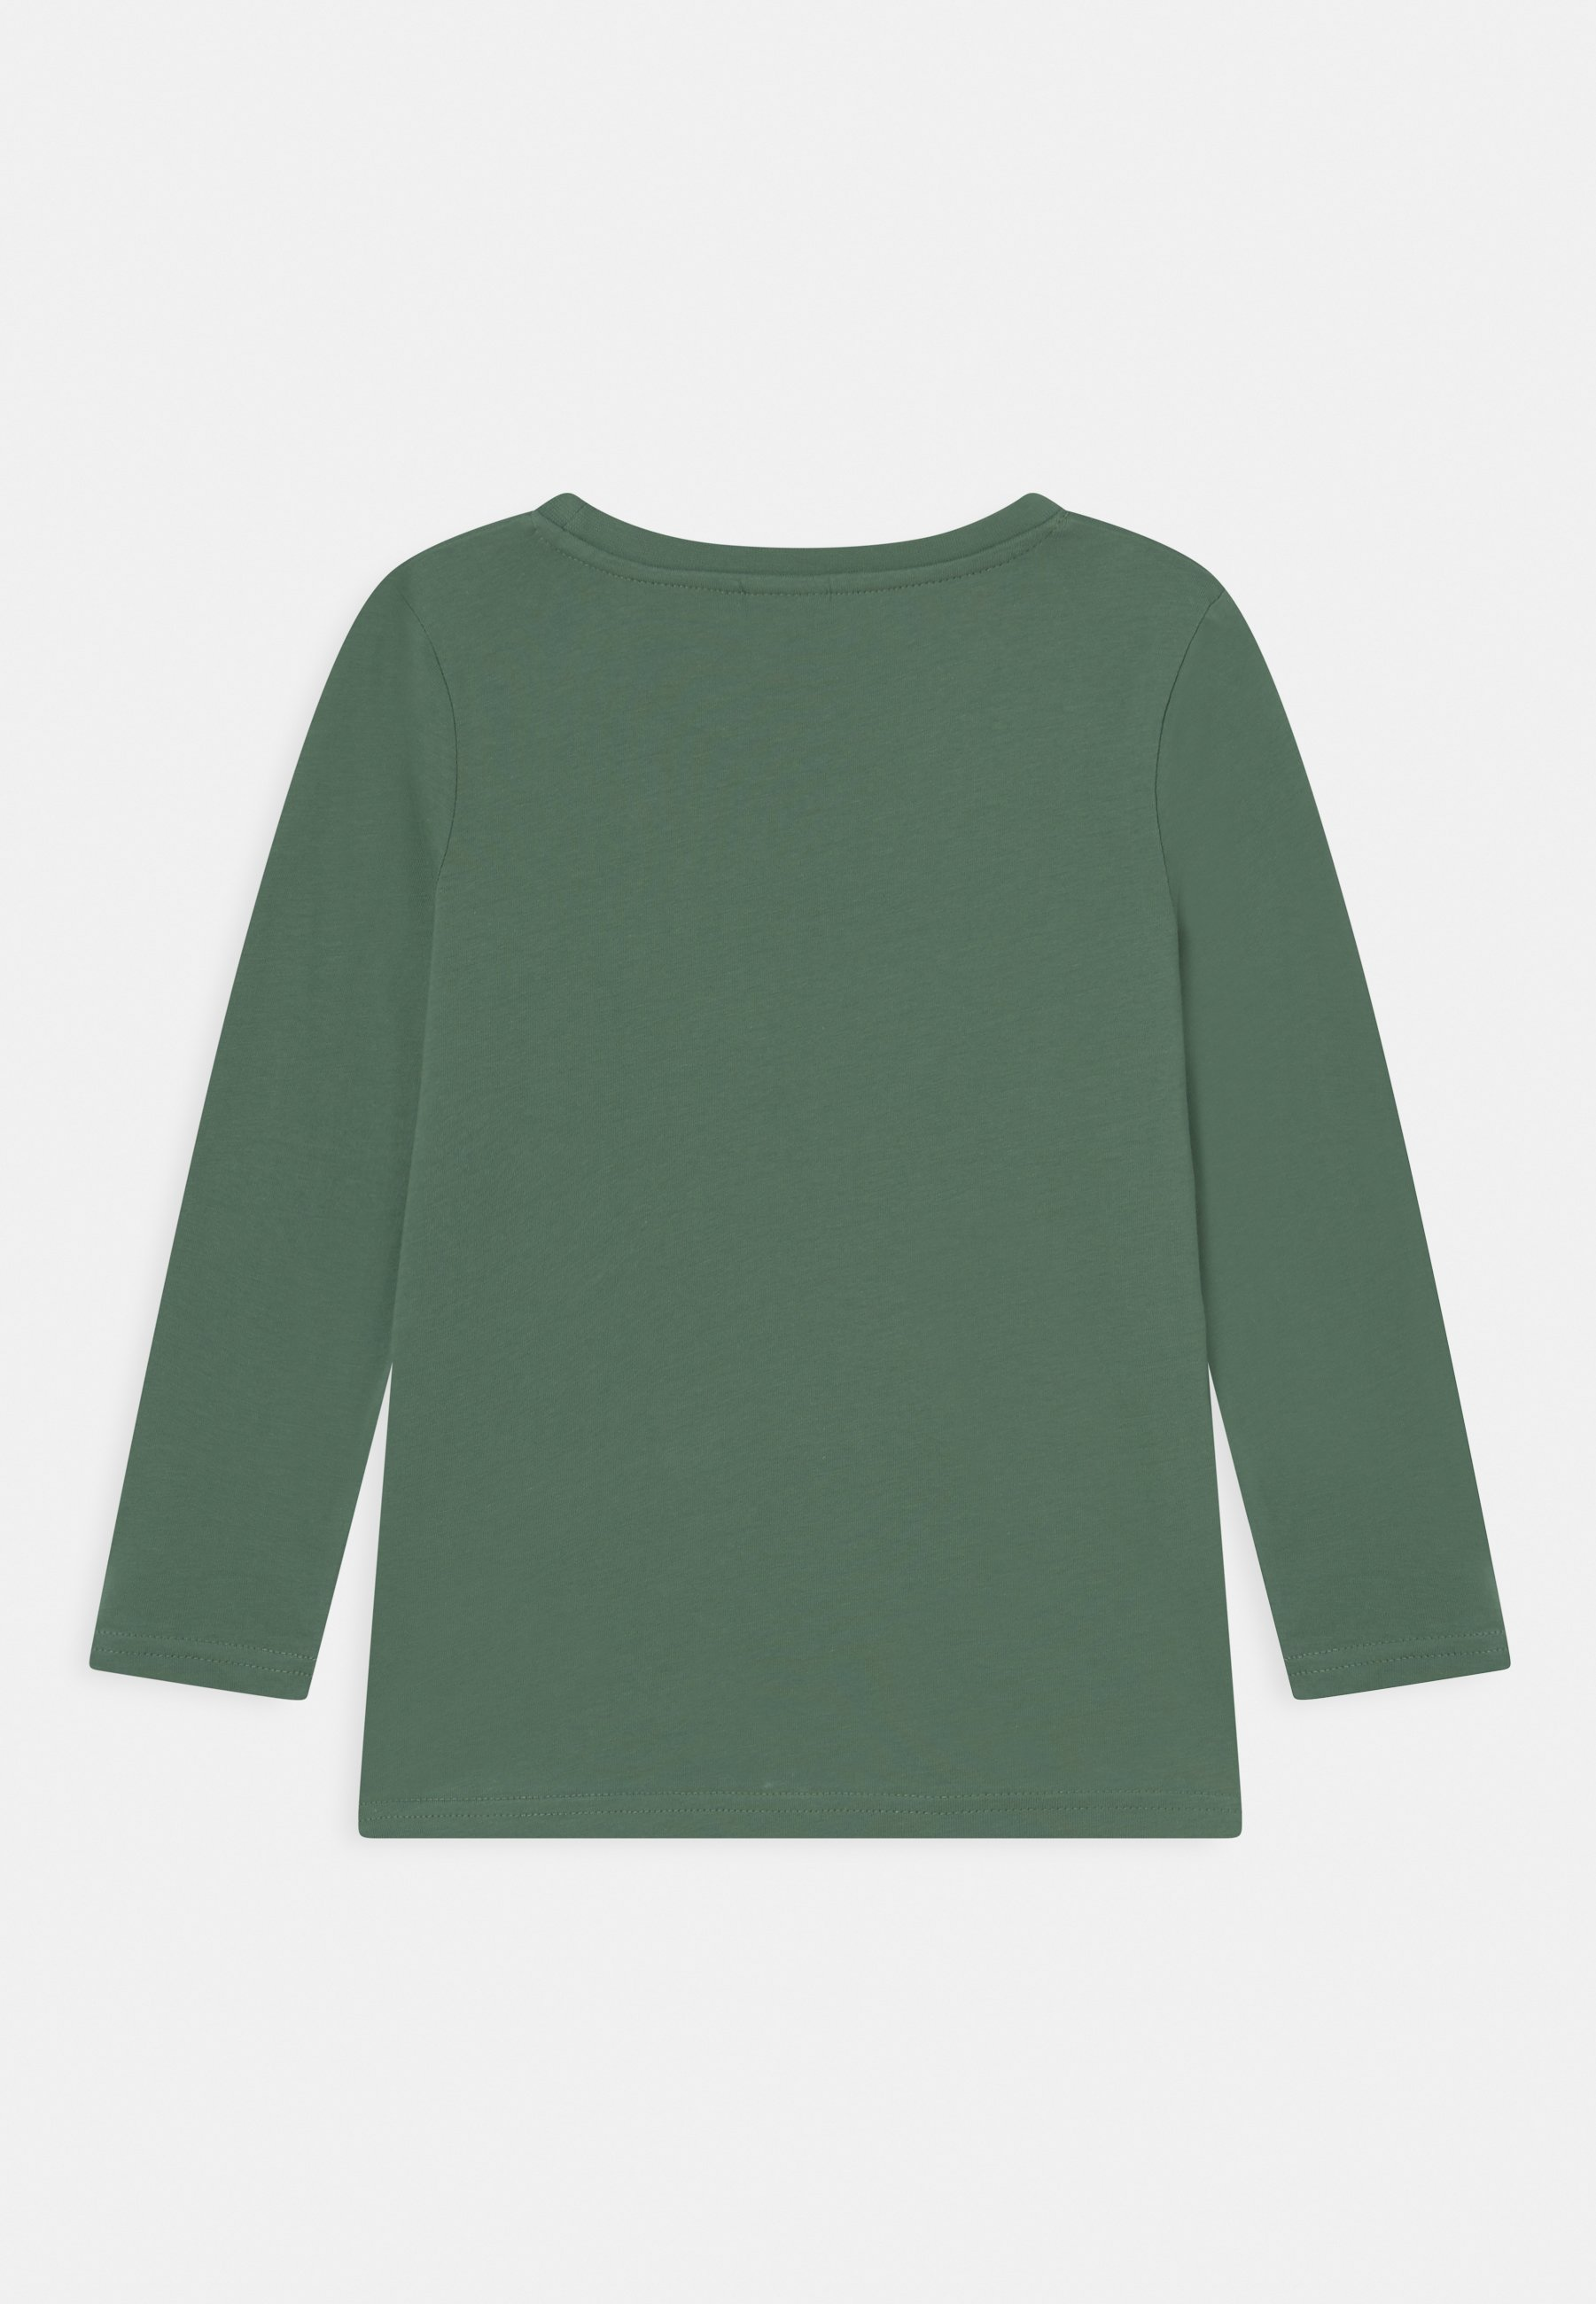 Kids SCHOOL START UNISEX - Long sleeved top